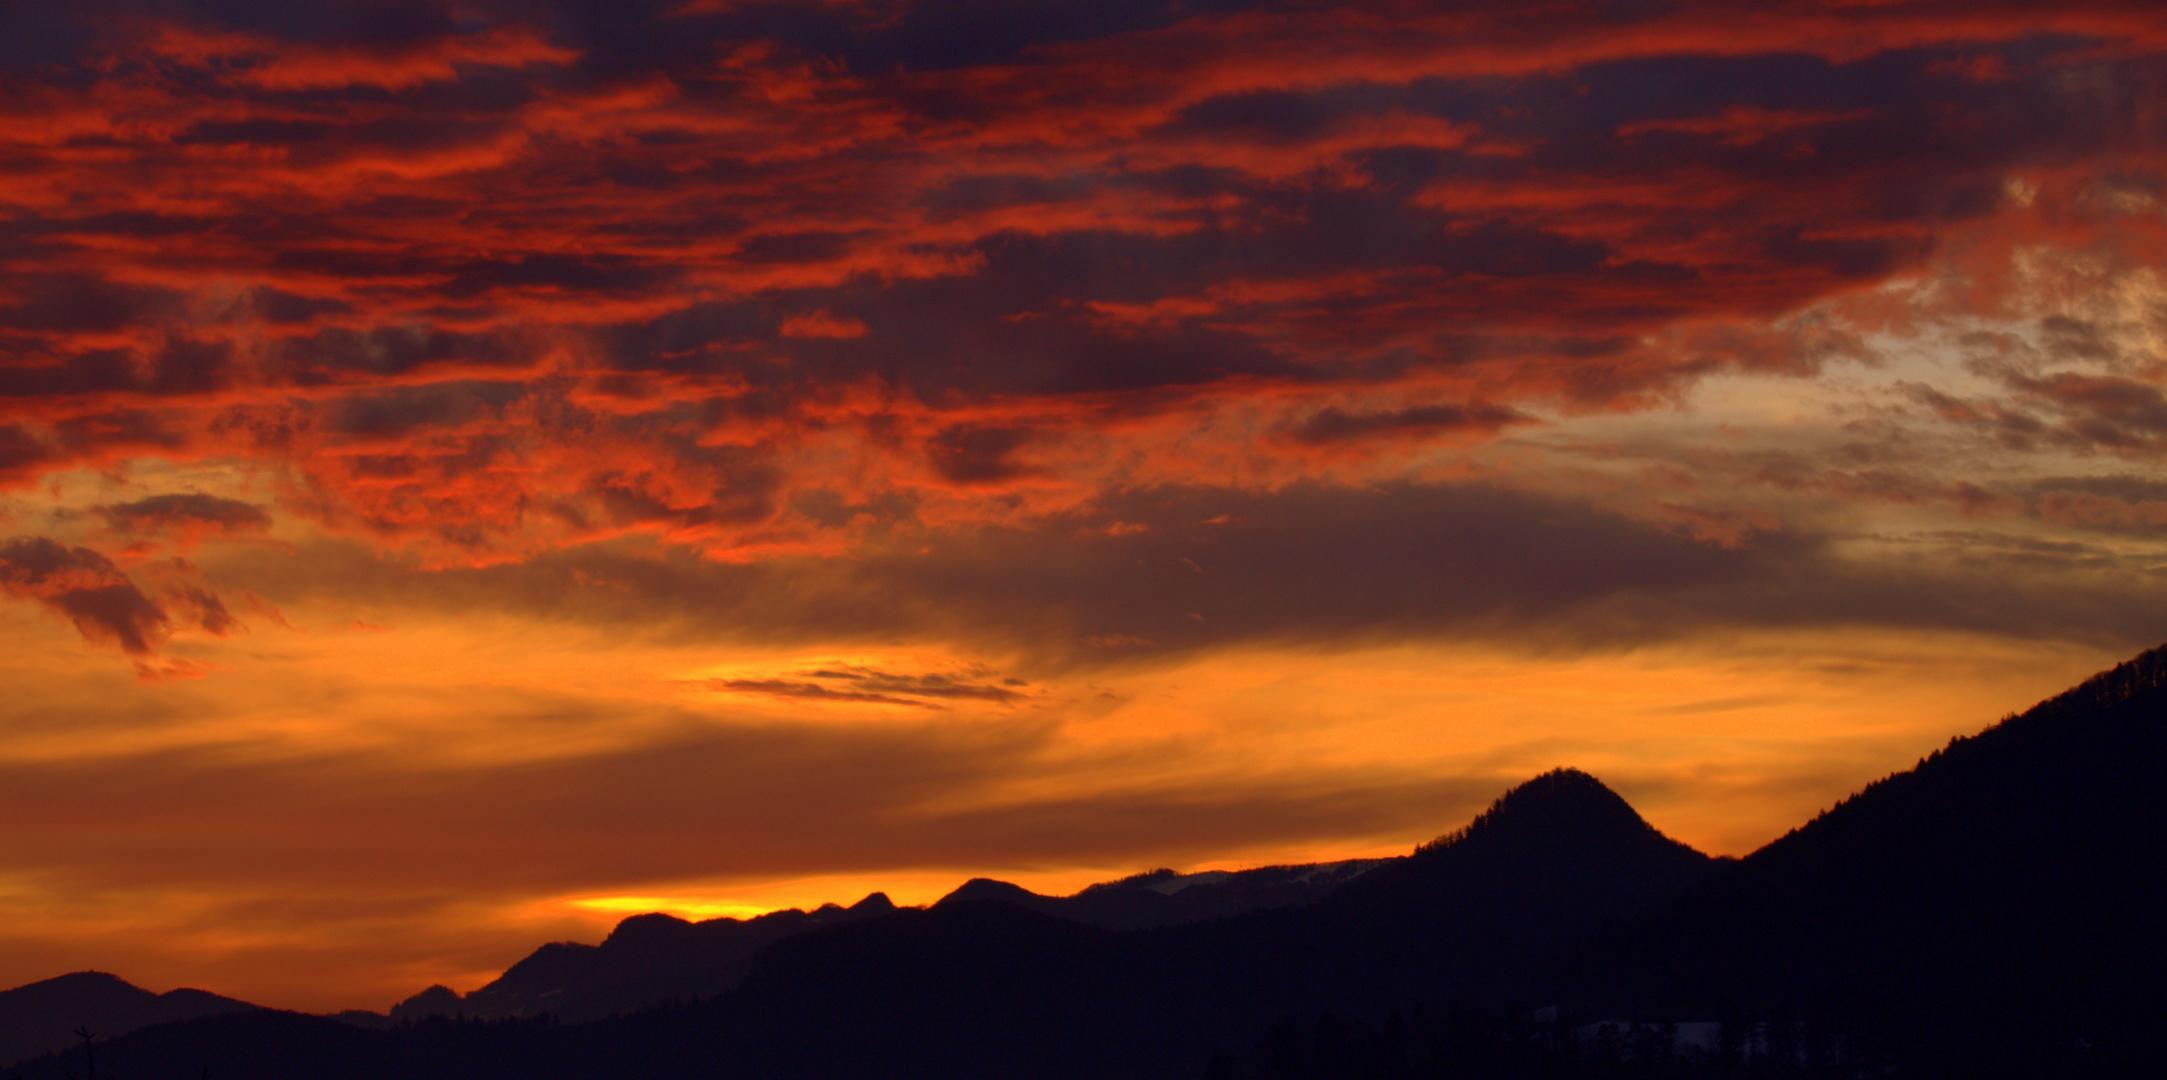 Sonnenaufgang phasen